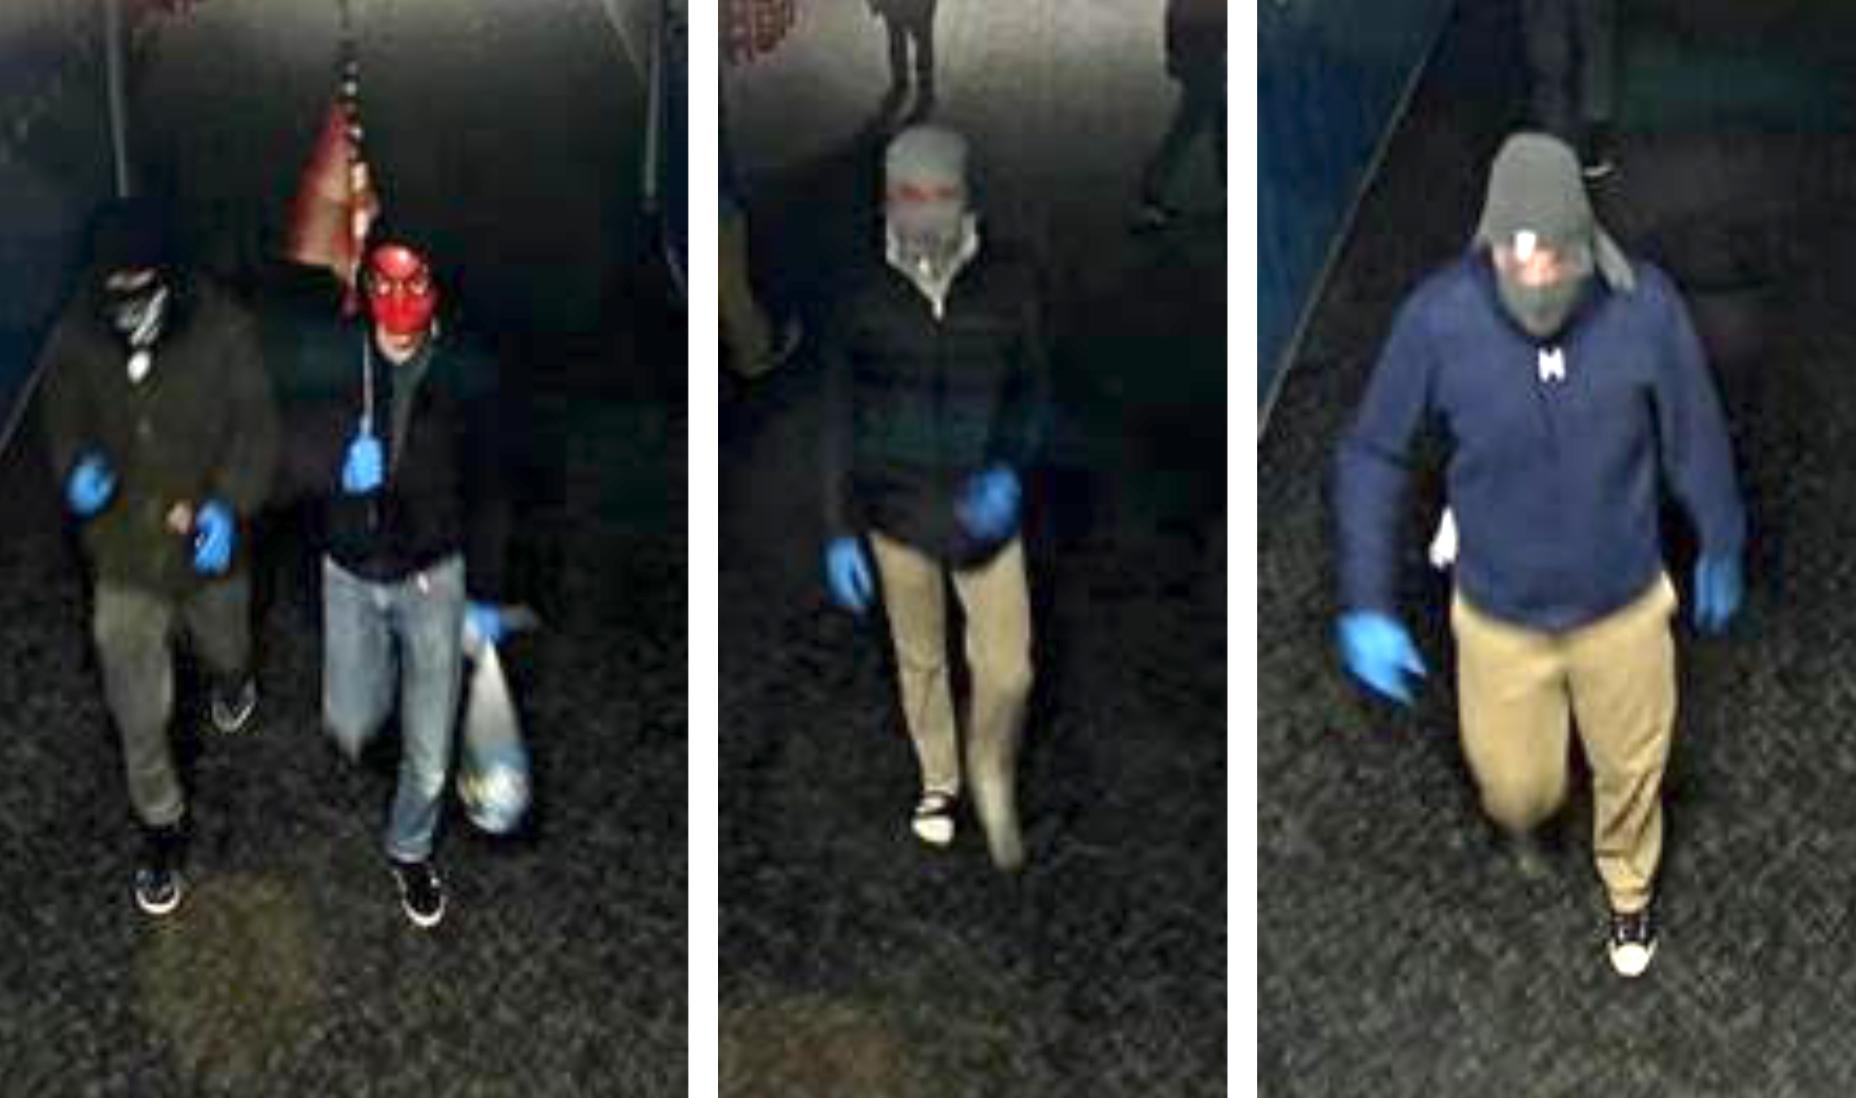 Police released surveillance video stills that allegedly show burglars in Madison Jr. High School on May 19, 2020.